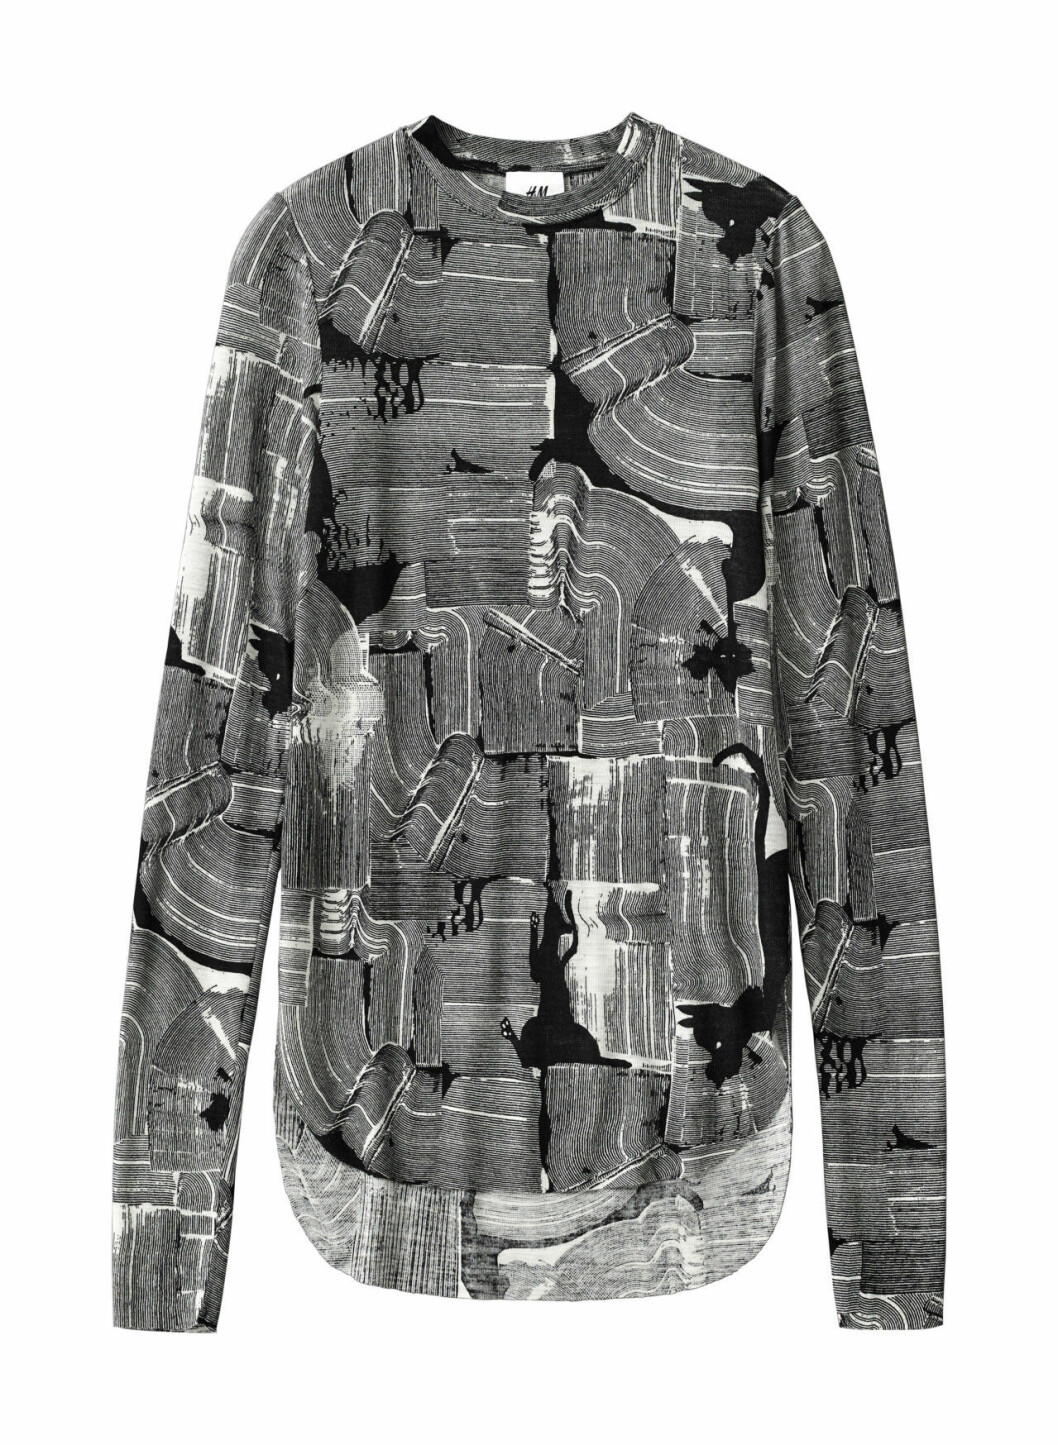 H&M Studio höstkollektion aw 2019 – svartvit tröja